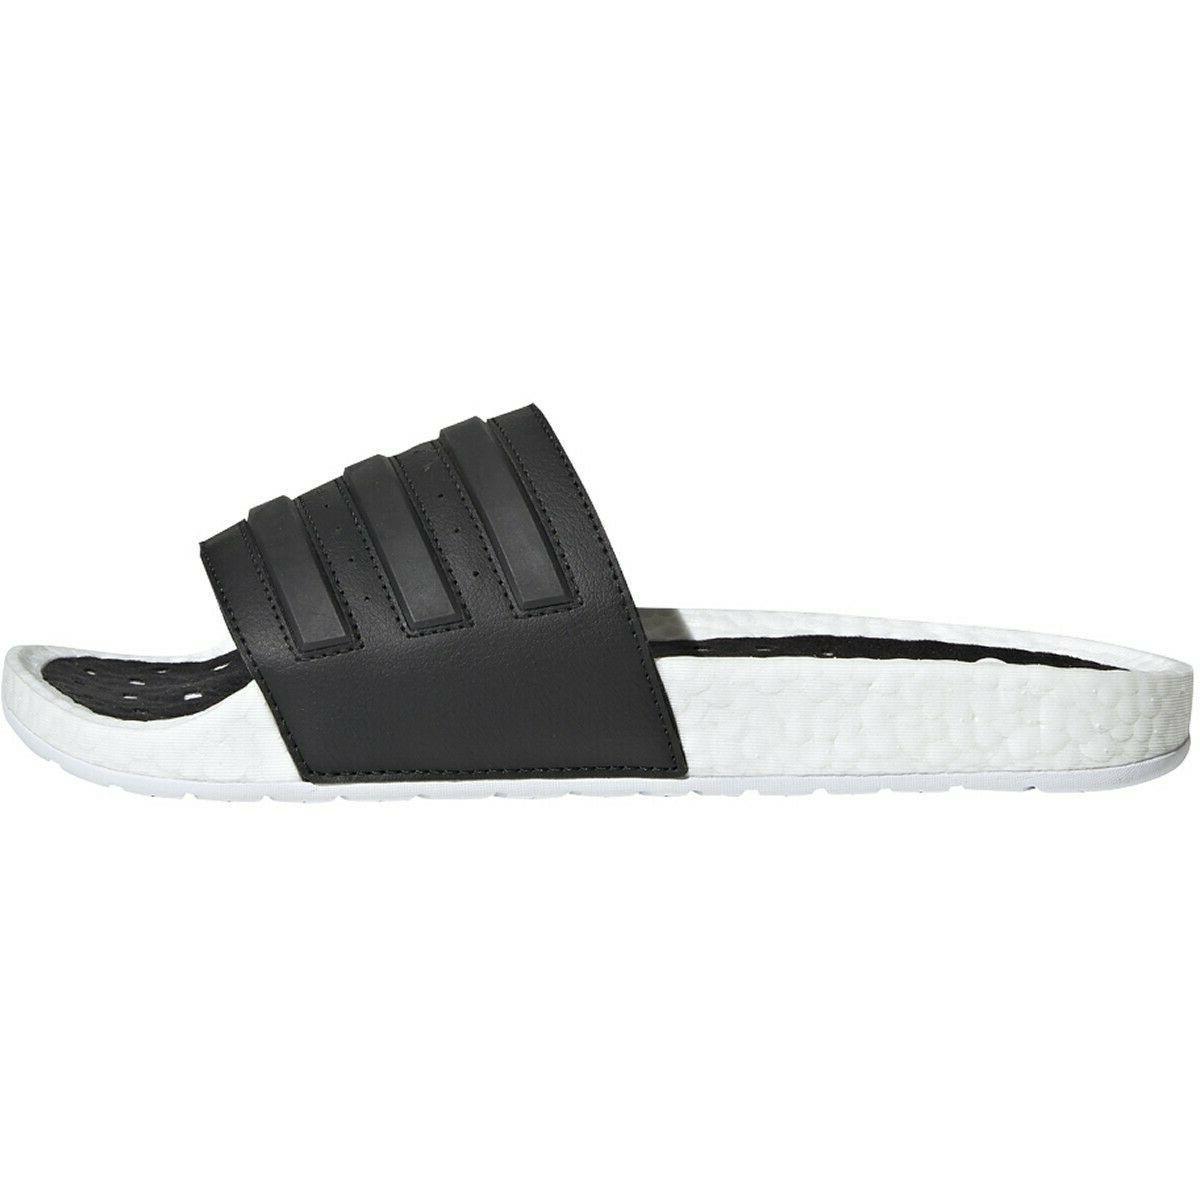 men s adilette boost slides sandals flip